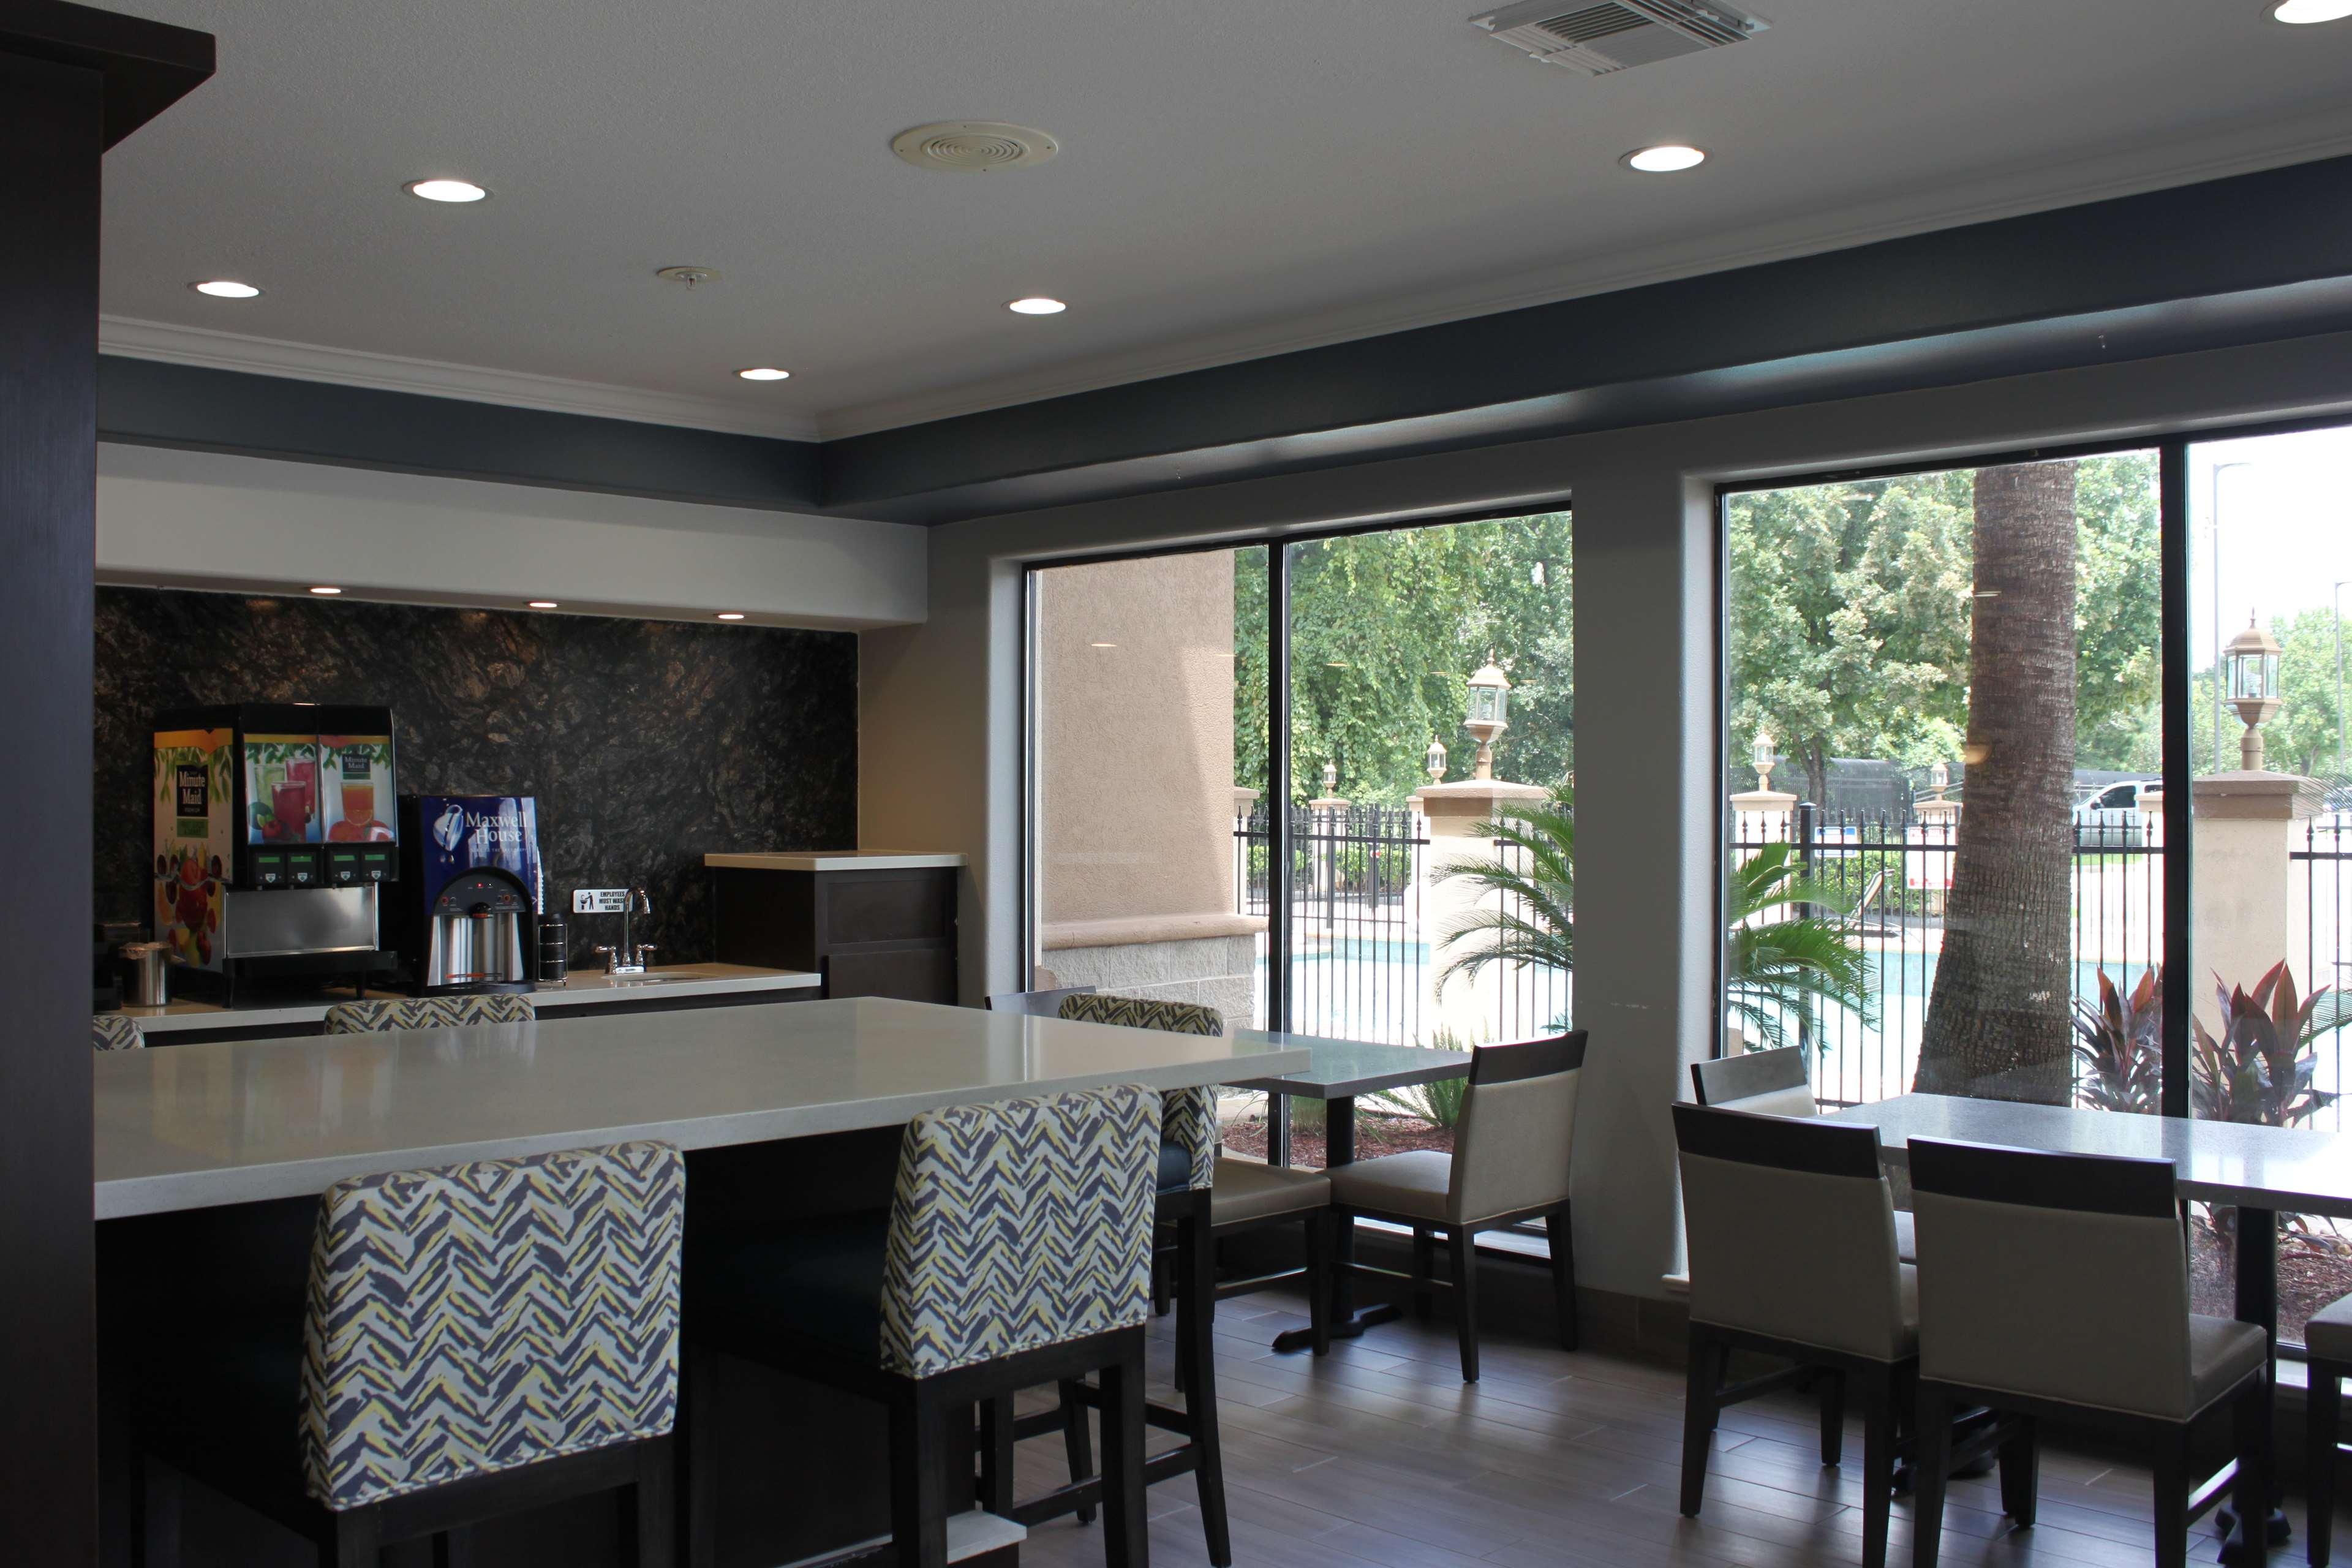 Best Western Plus North Houston Inn & Suites image 7